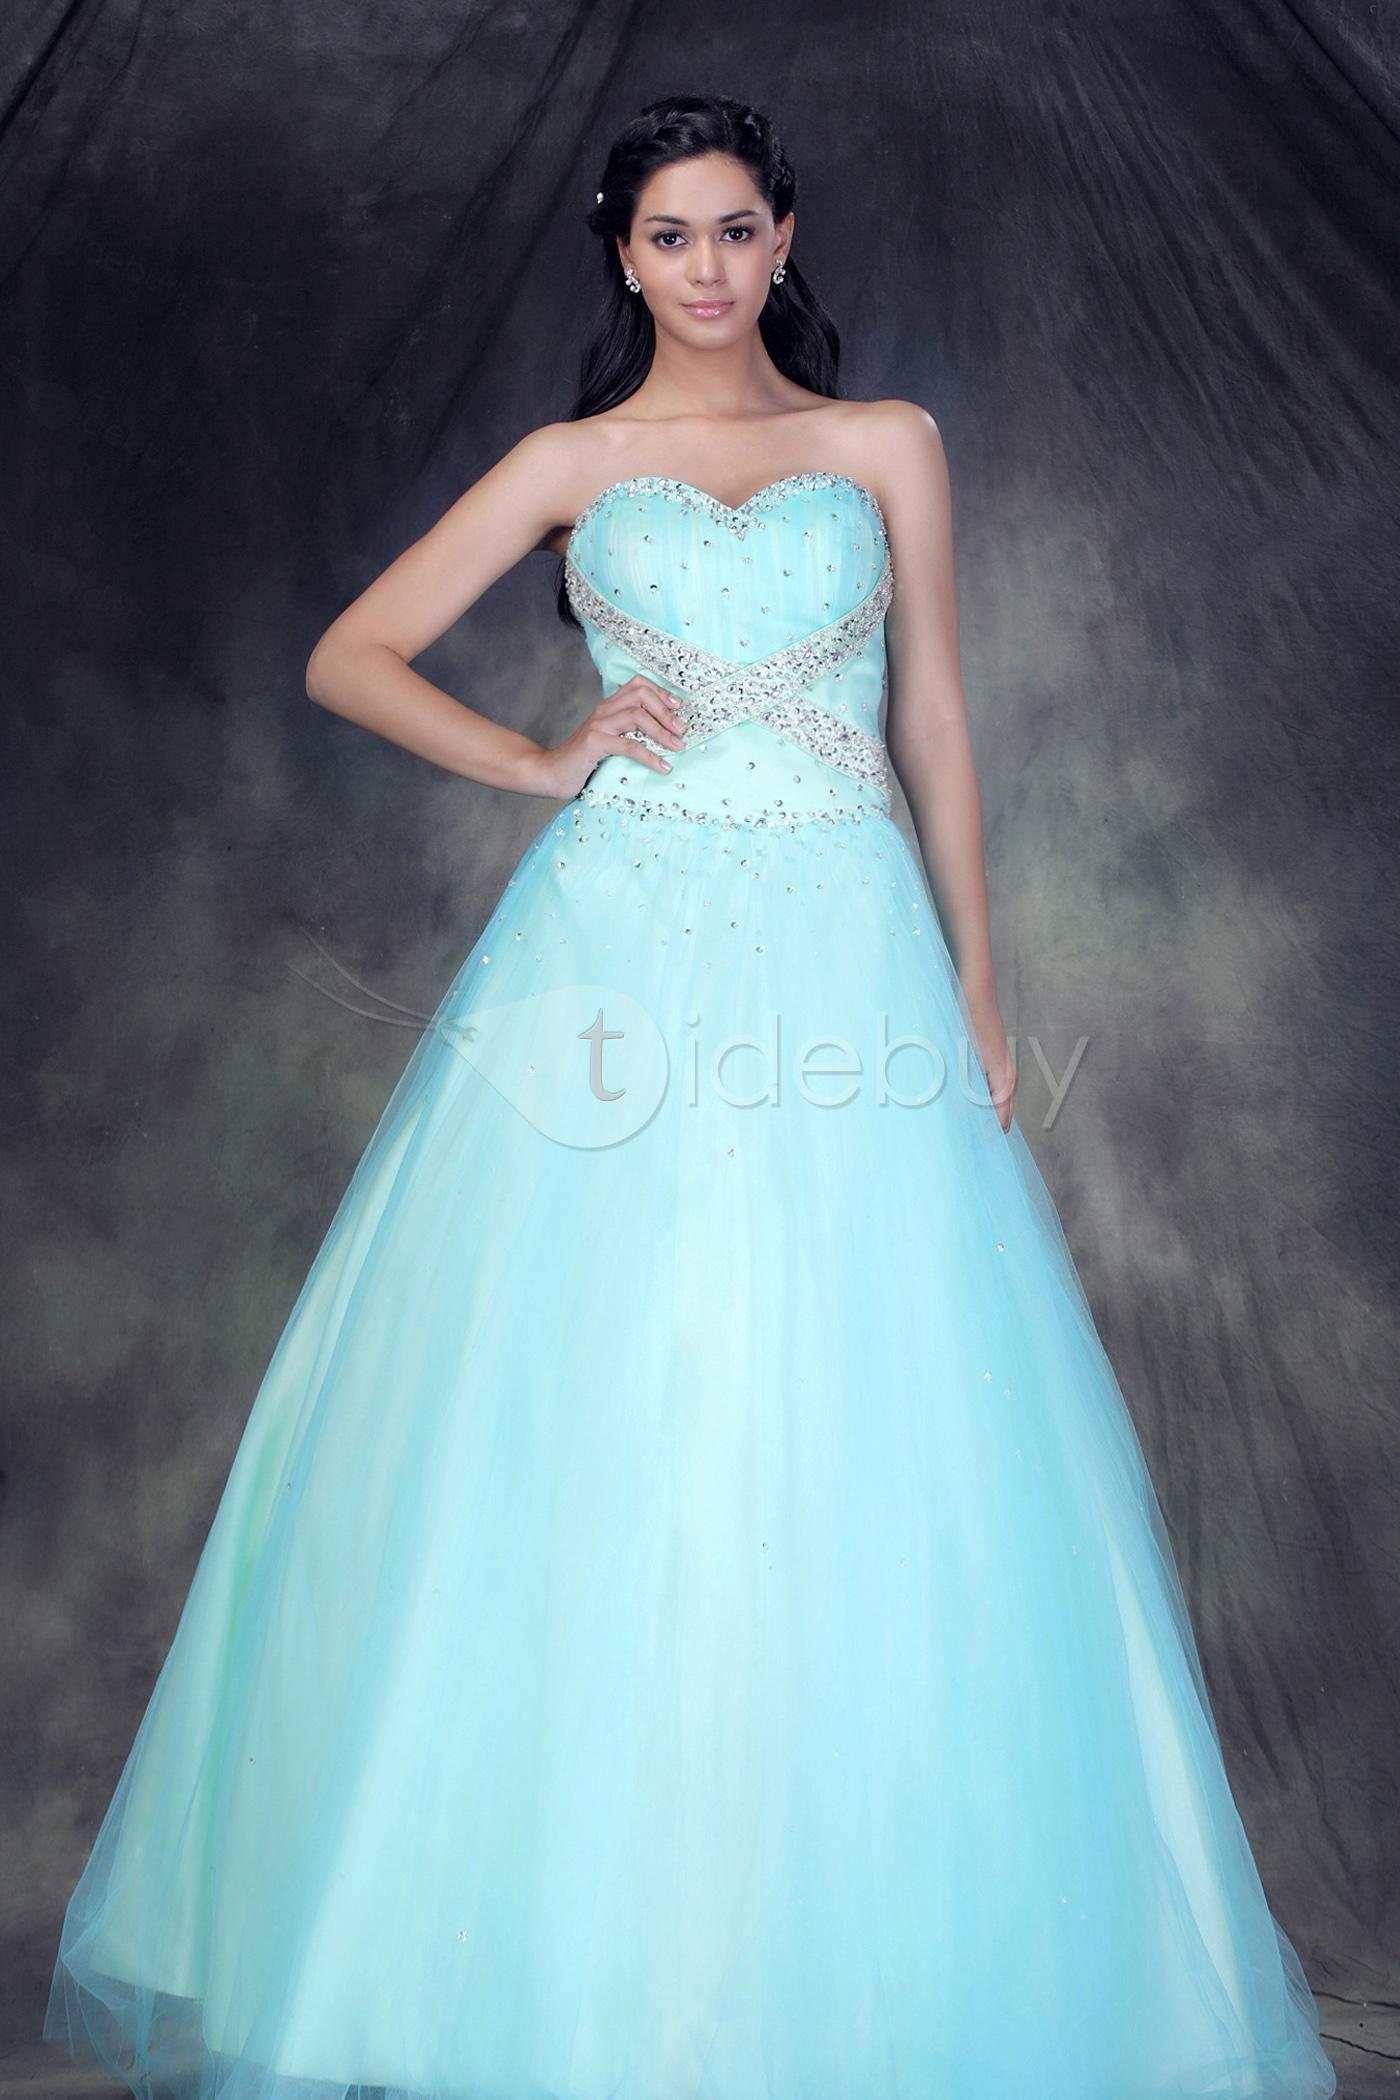 Elegant Sweetheart Floor-length Anderae's Ball Gown Dress